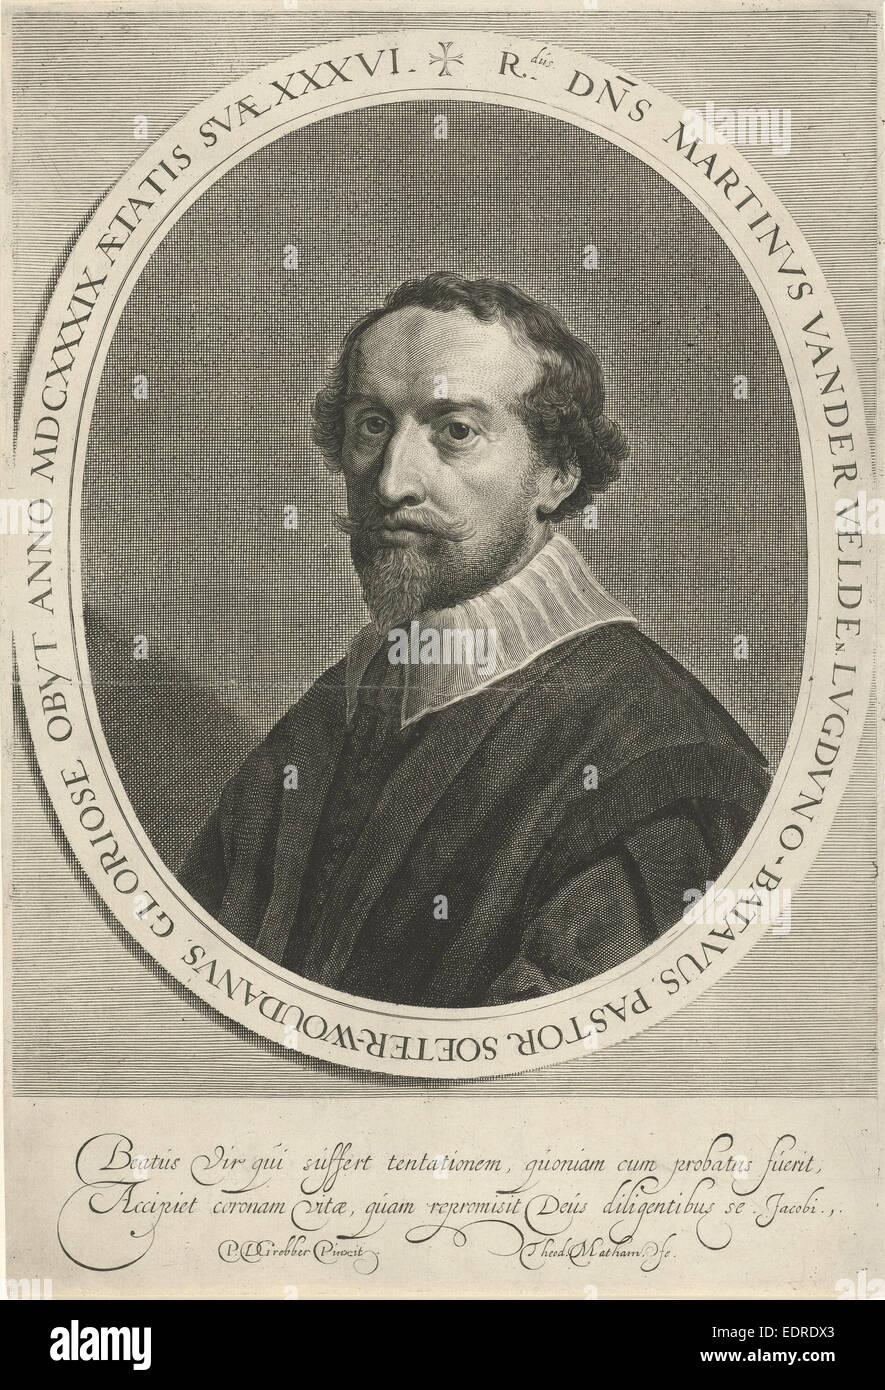 Portrait of Martinus van Velden, Theodor Matham, 1639 - 1676 - Stock Image